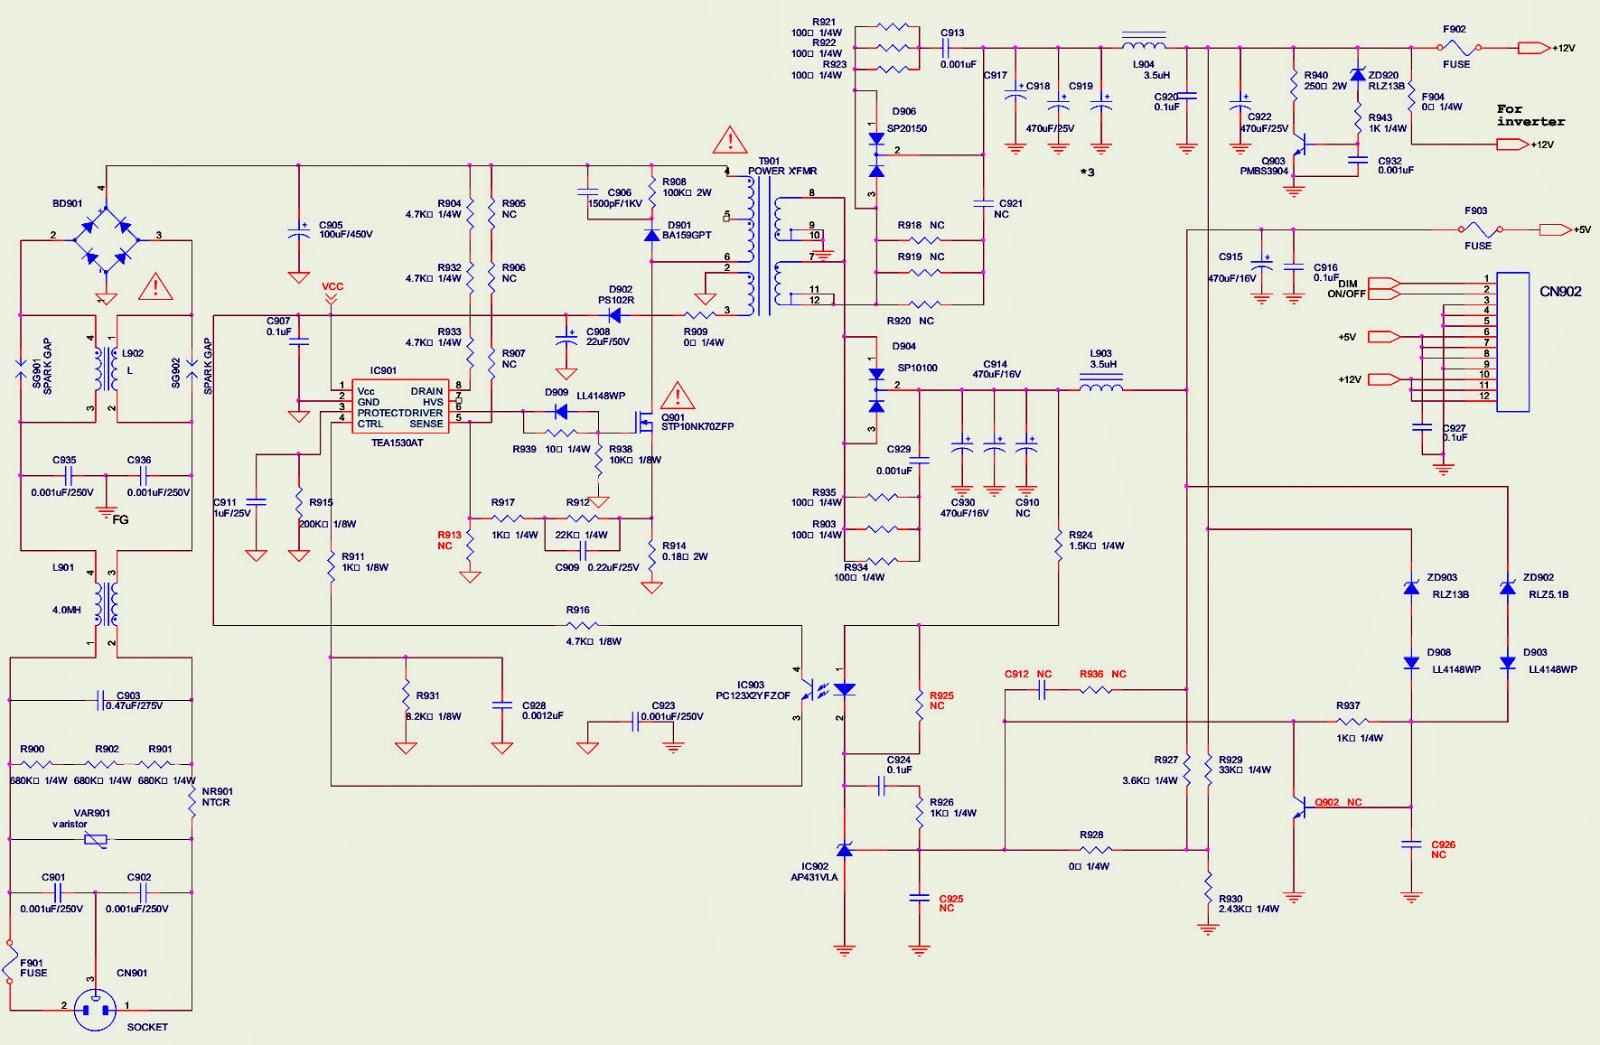 aoc 212va monitor power supply schematic circuit diagram troubleshooting [ 1600 x 1045 Pixel ]